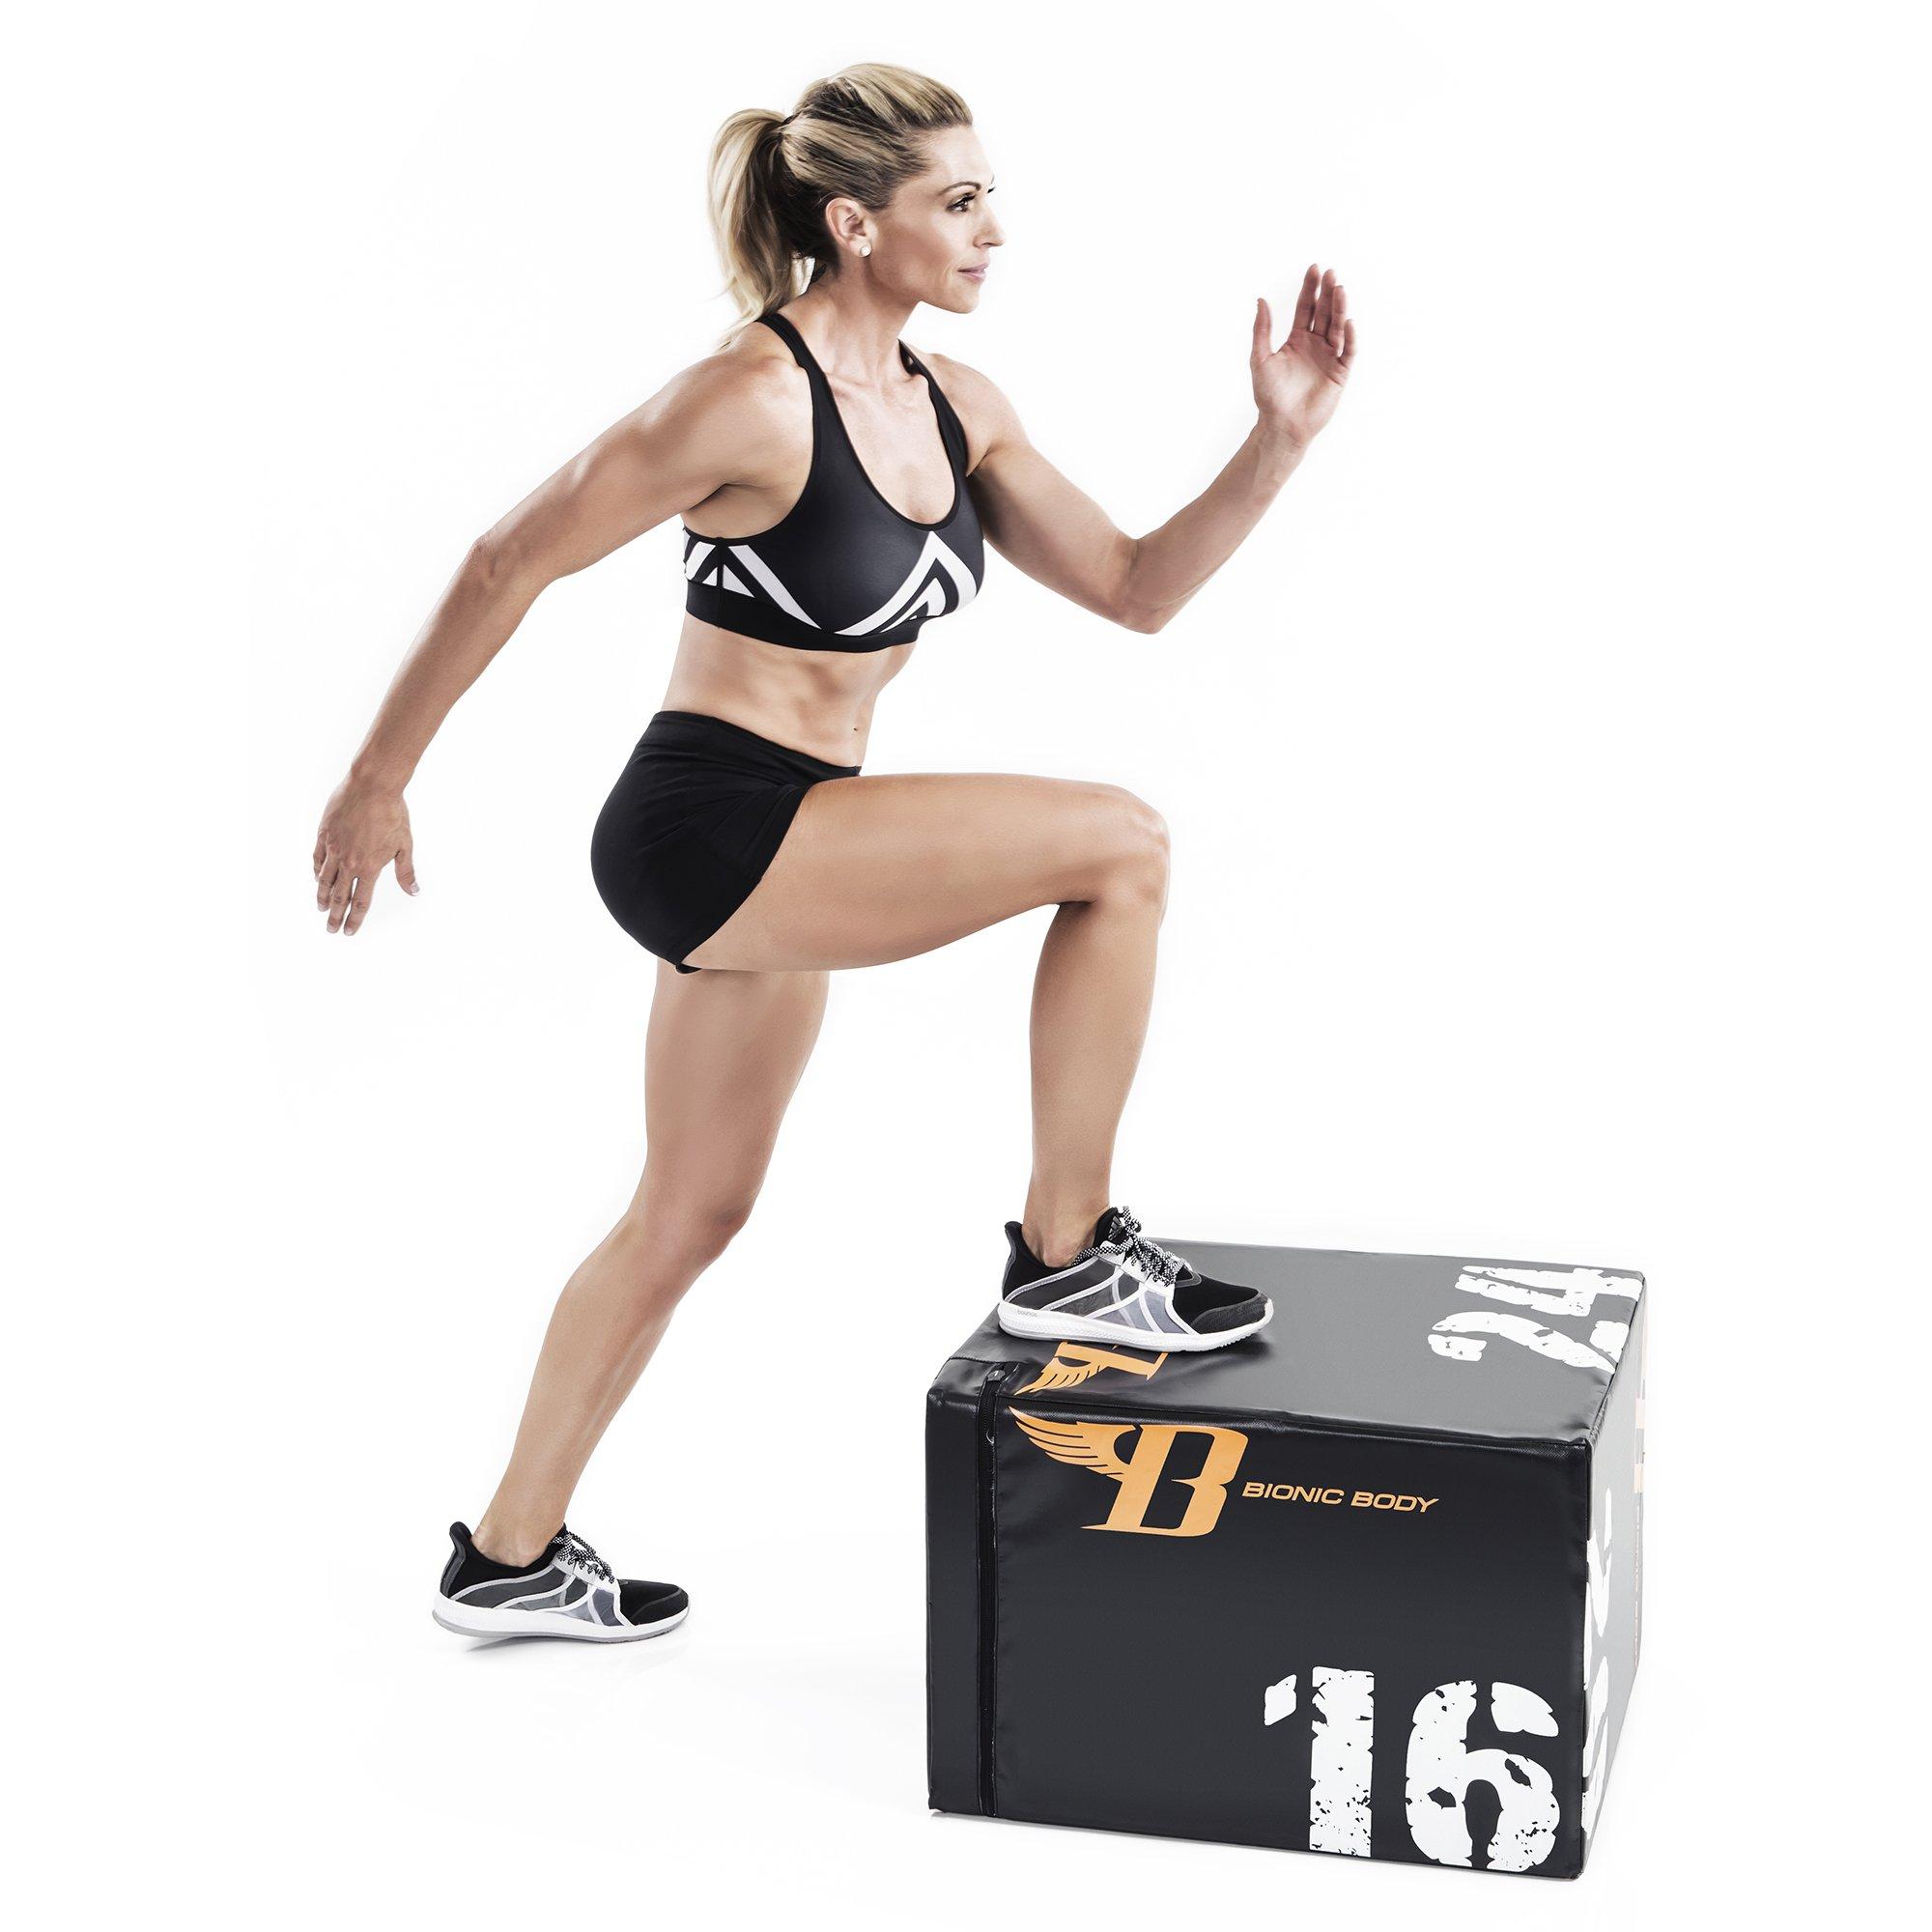 Bionic Body Plyo Exercise Box Plyometric Box with Soft Cover BBPB-1106 by Bionic Body (Image #2)